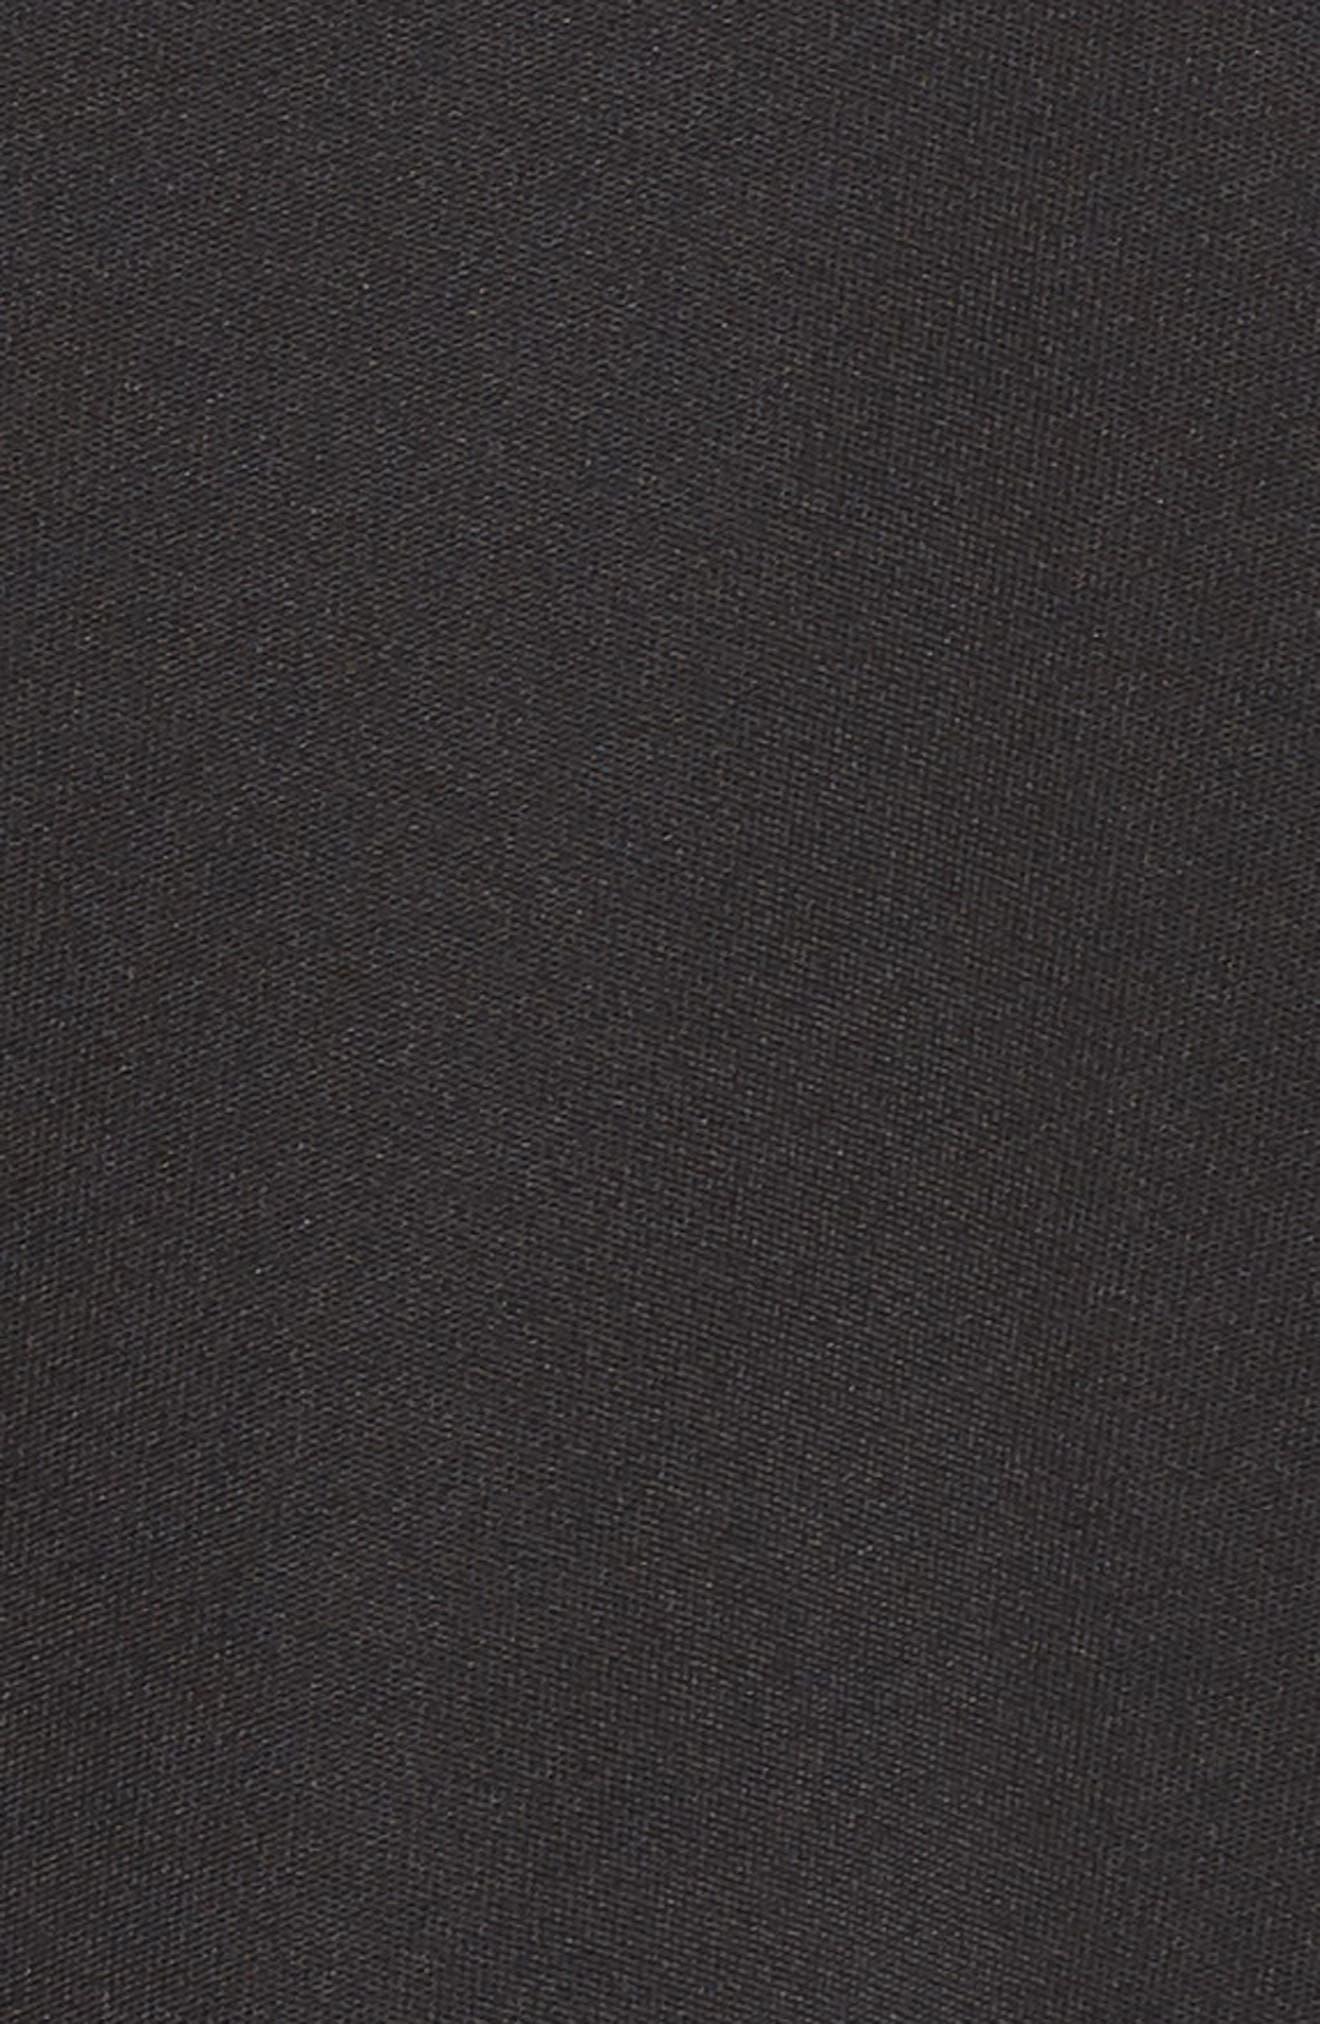 Dry Miler Tank,                             Alternate thumbnail 6, color,                             BLACK